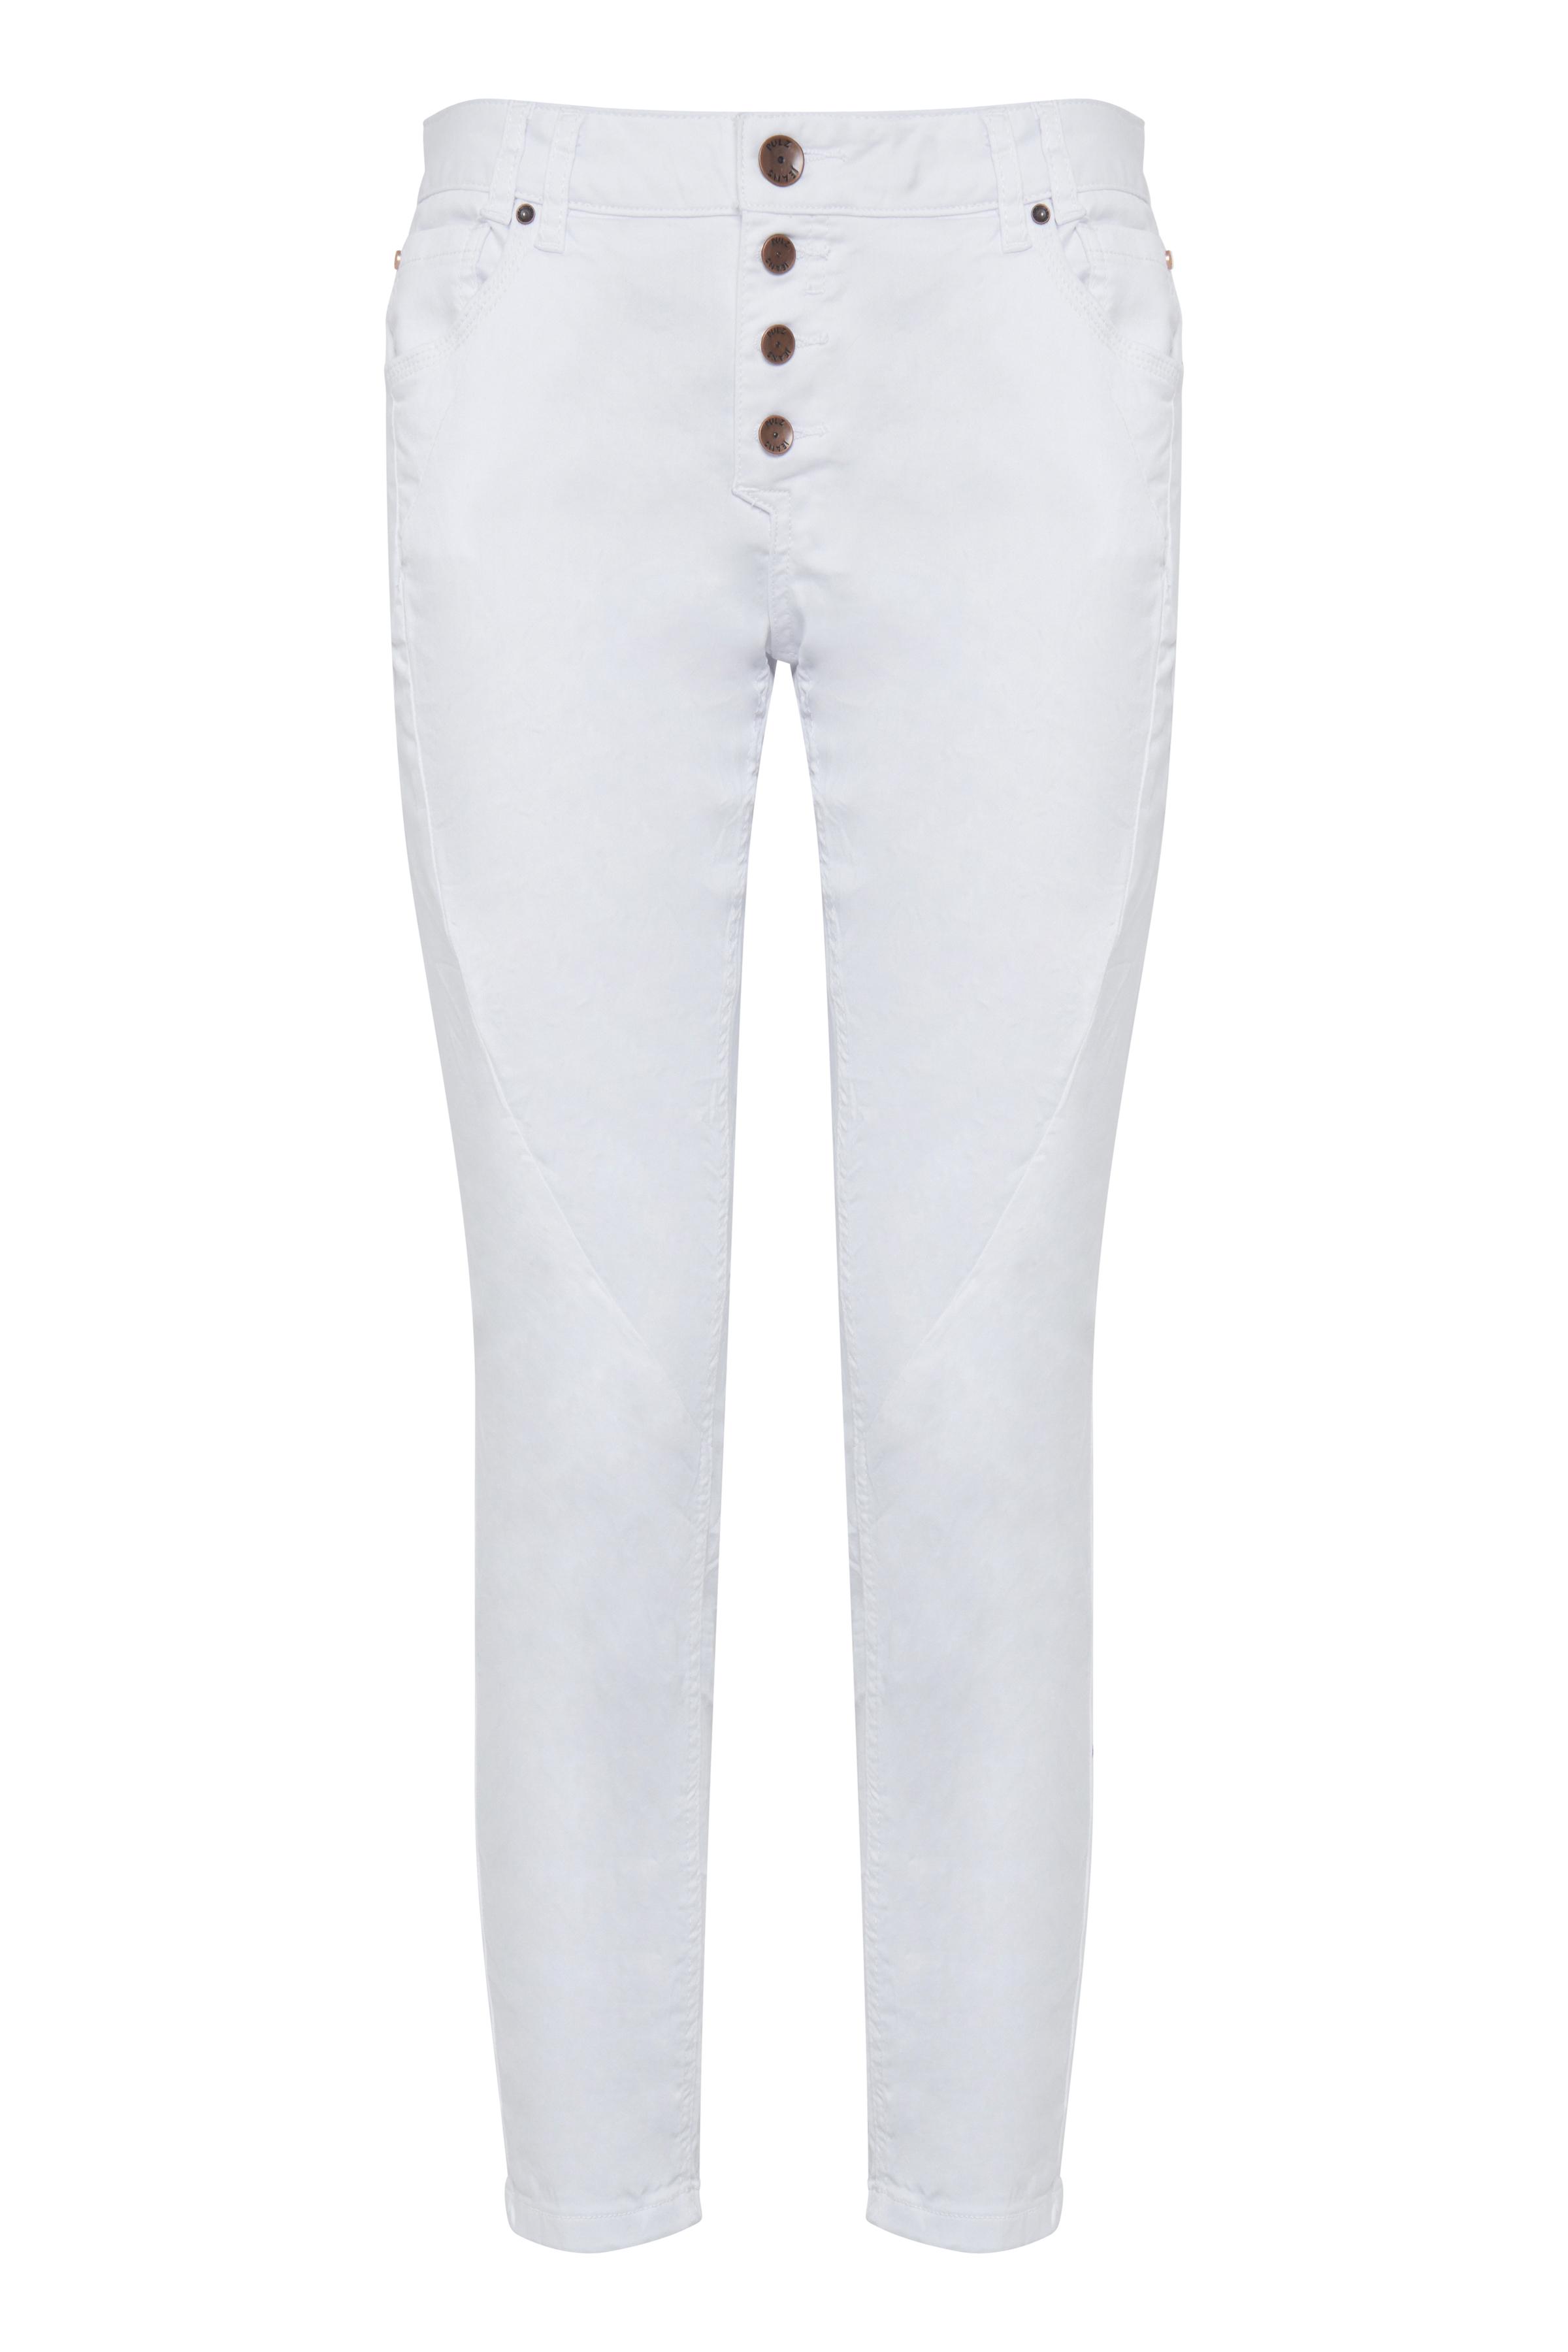 Pulz Jeans Dame 5-lommet Rosita ankelbukser  - Hvid